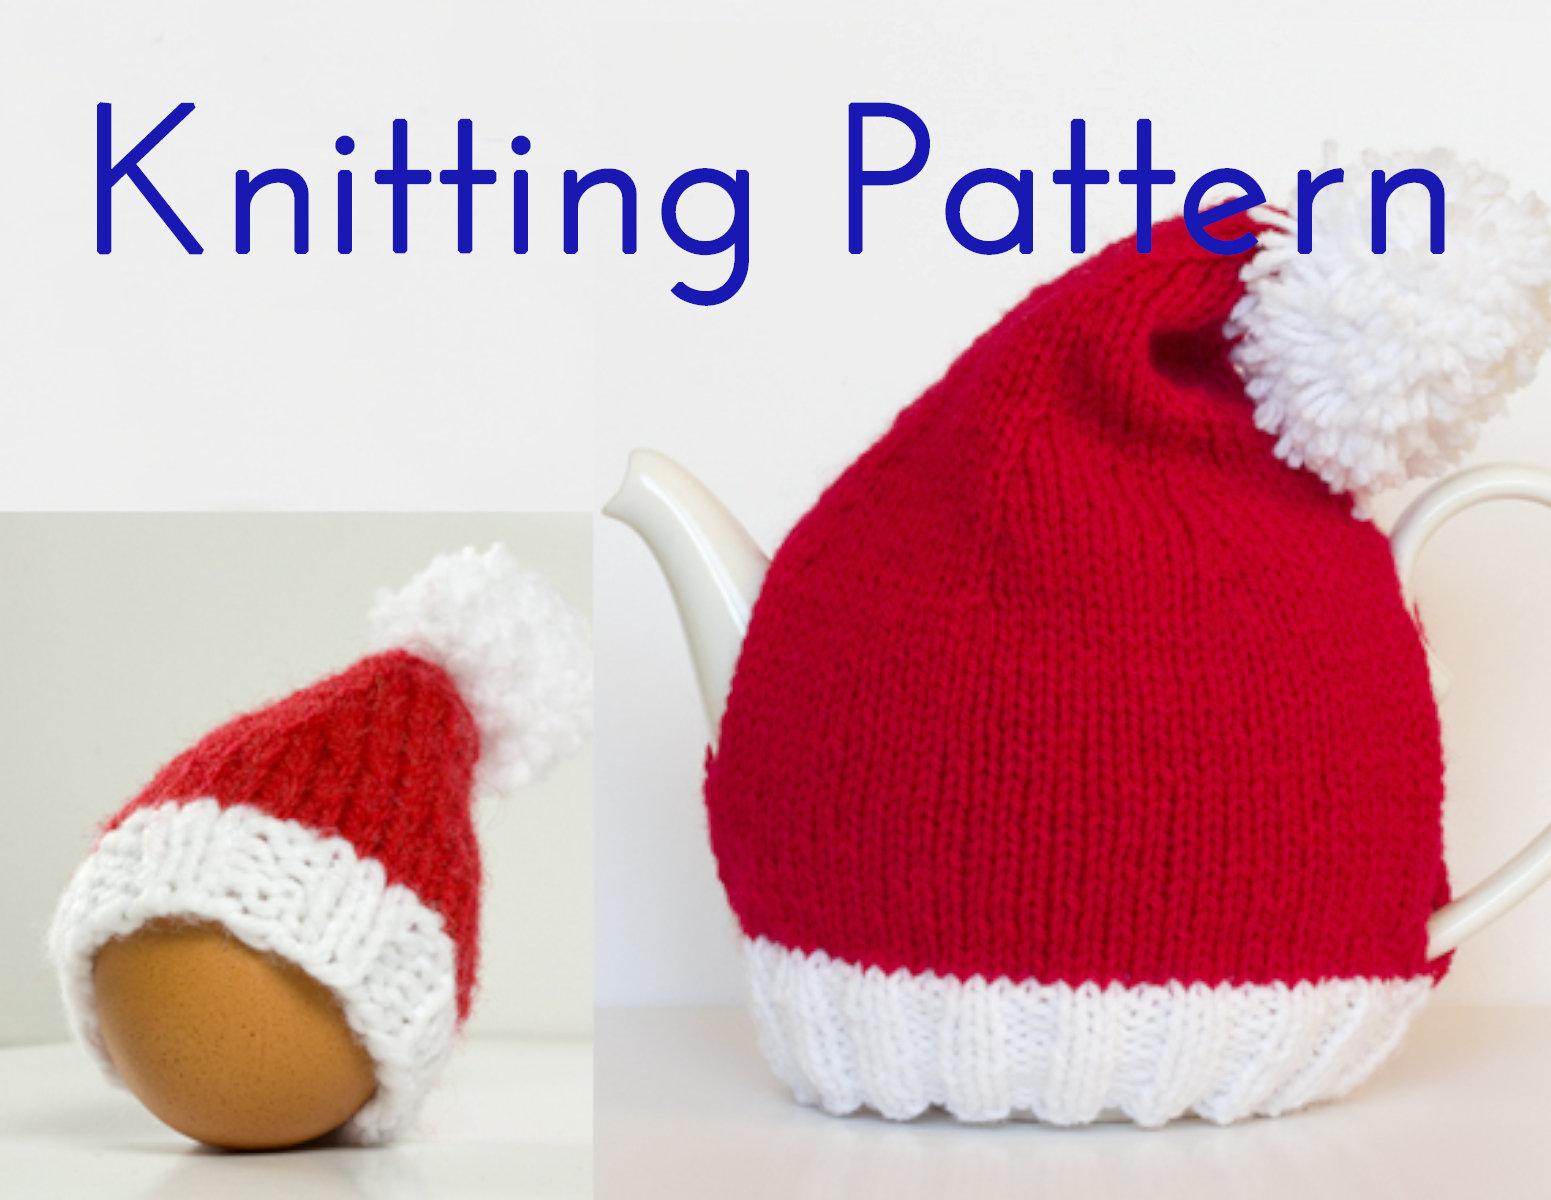 Santa Hat Knitting Pattern Pdf Knitting Pattern Santa Hat Tea Egg Cozies Diy Knit Tea Cosy Christmas Table Decoration Knitting Instructions Aranworsted Weight